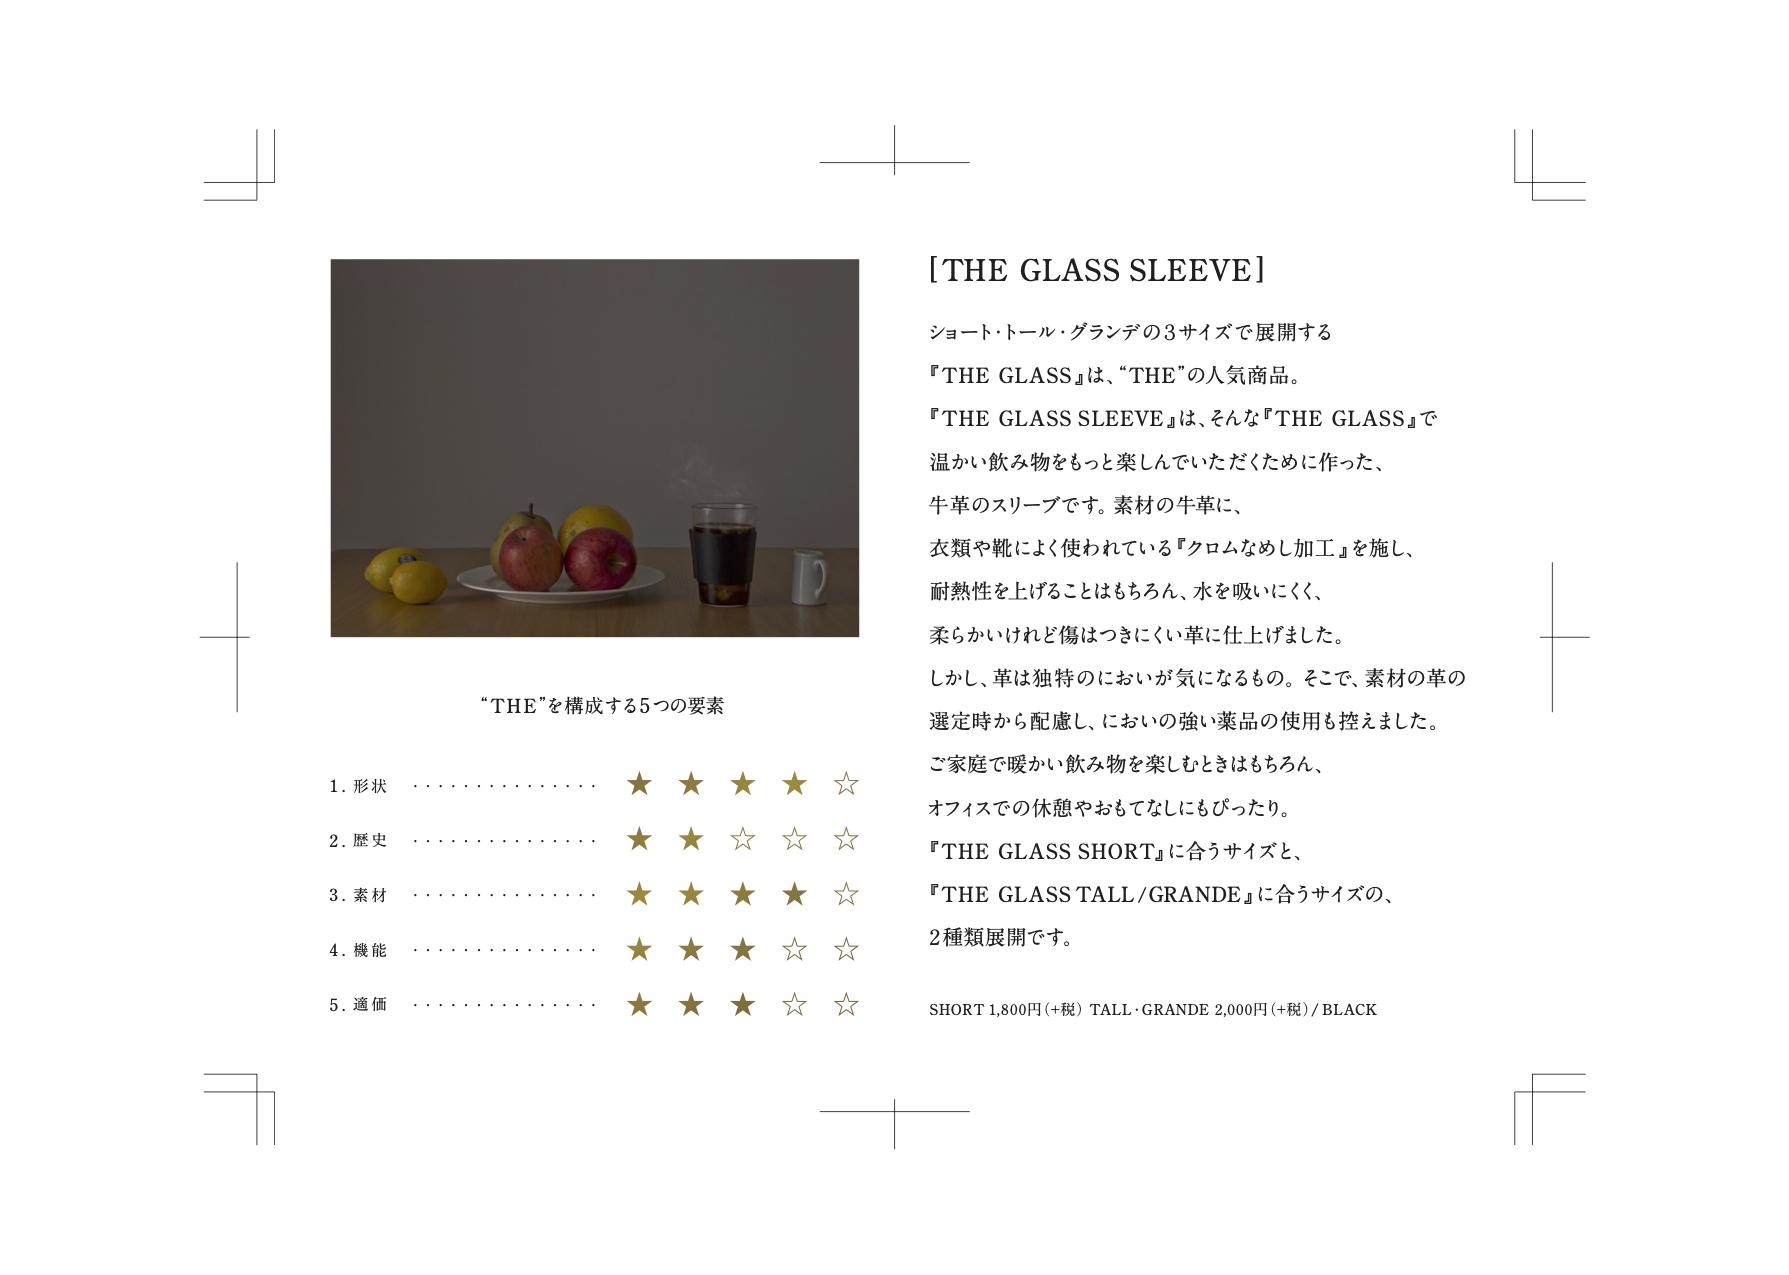 THE GLASS SLEEVE